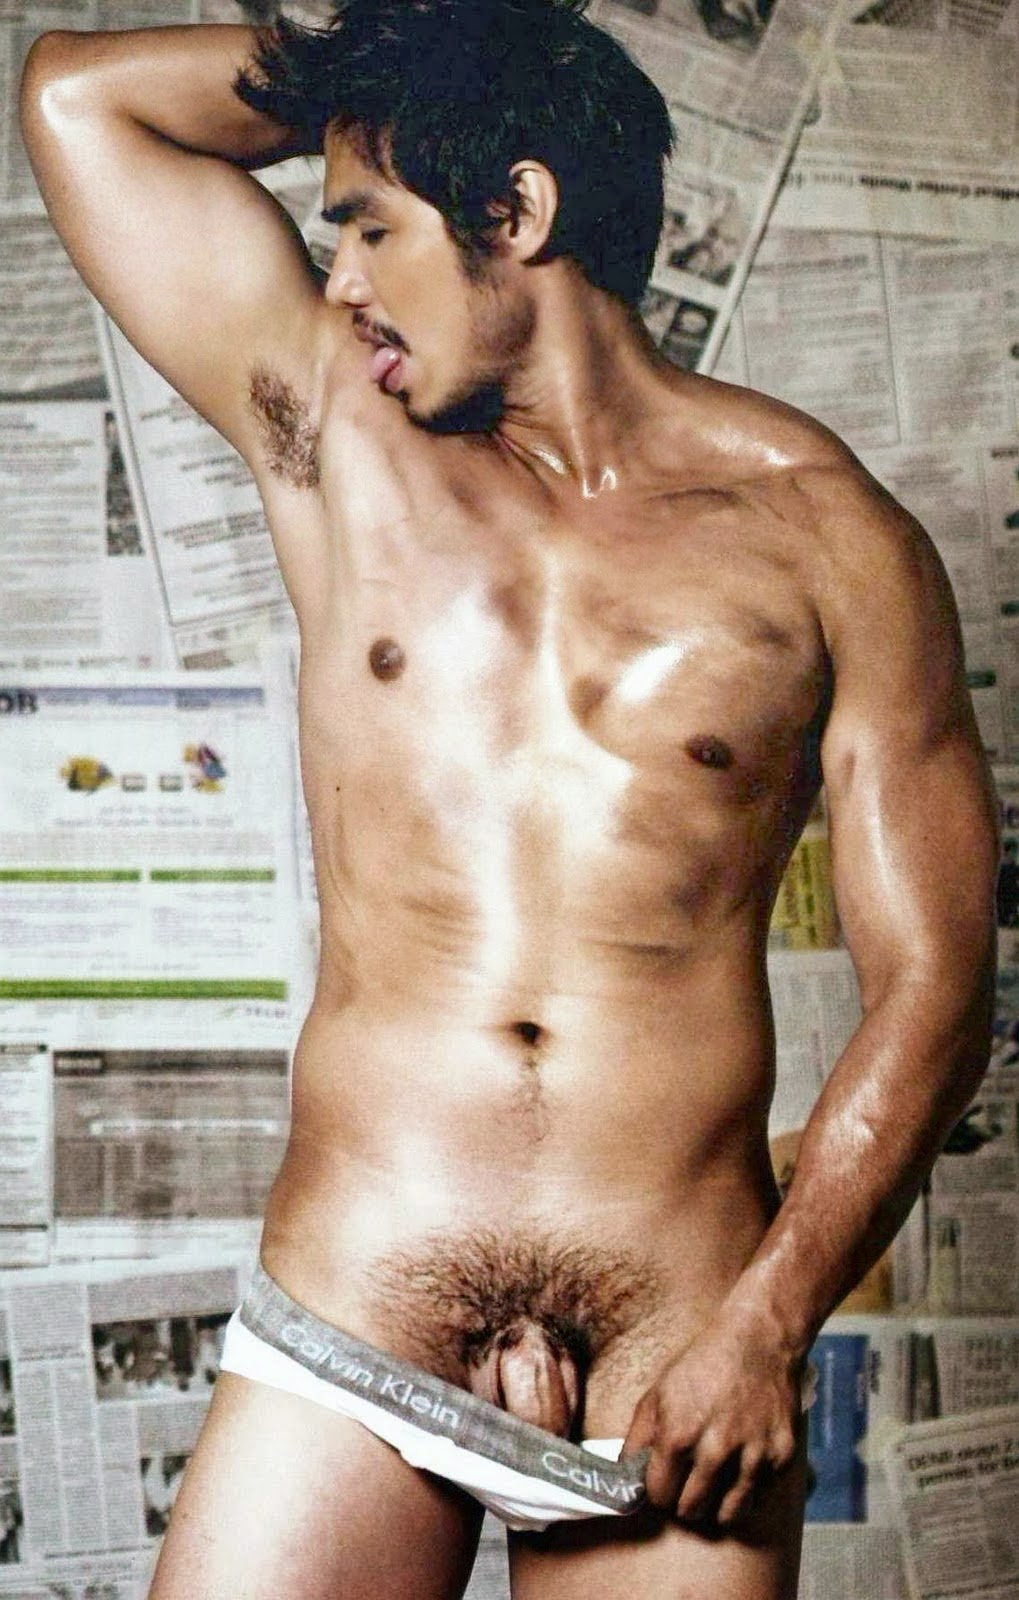 Pinoy celebrities man on man gay sex 4